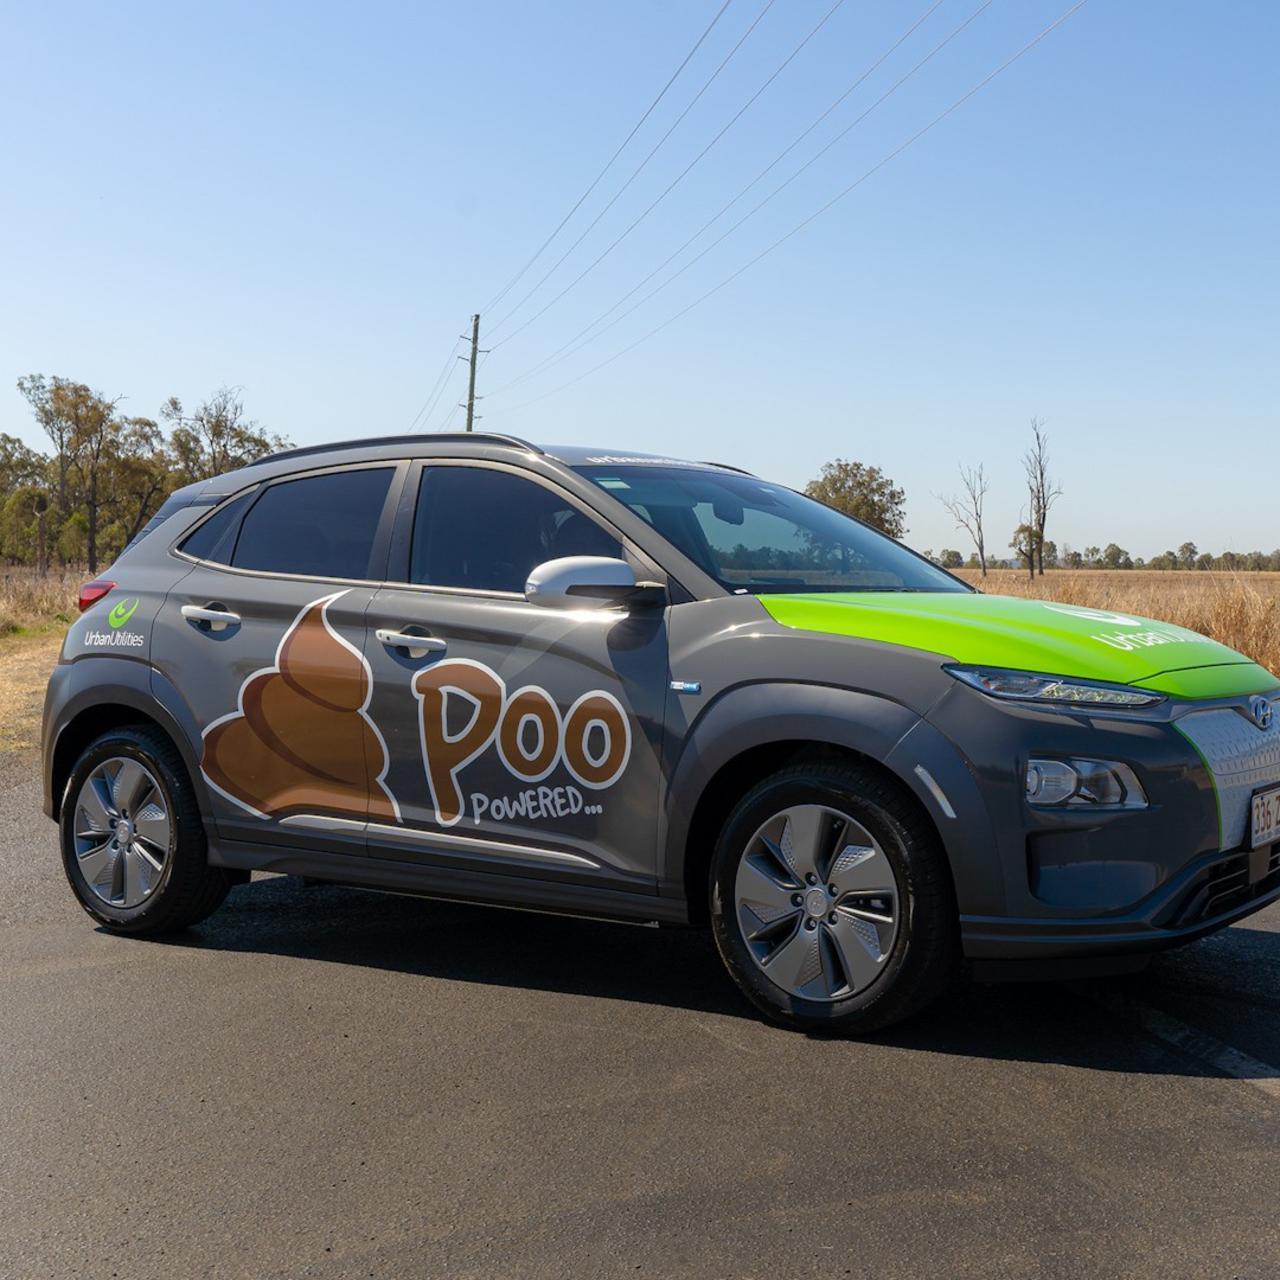 Australia's first Poo powered Car